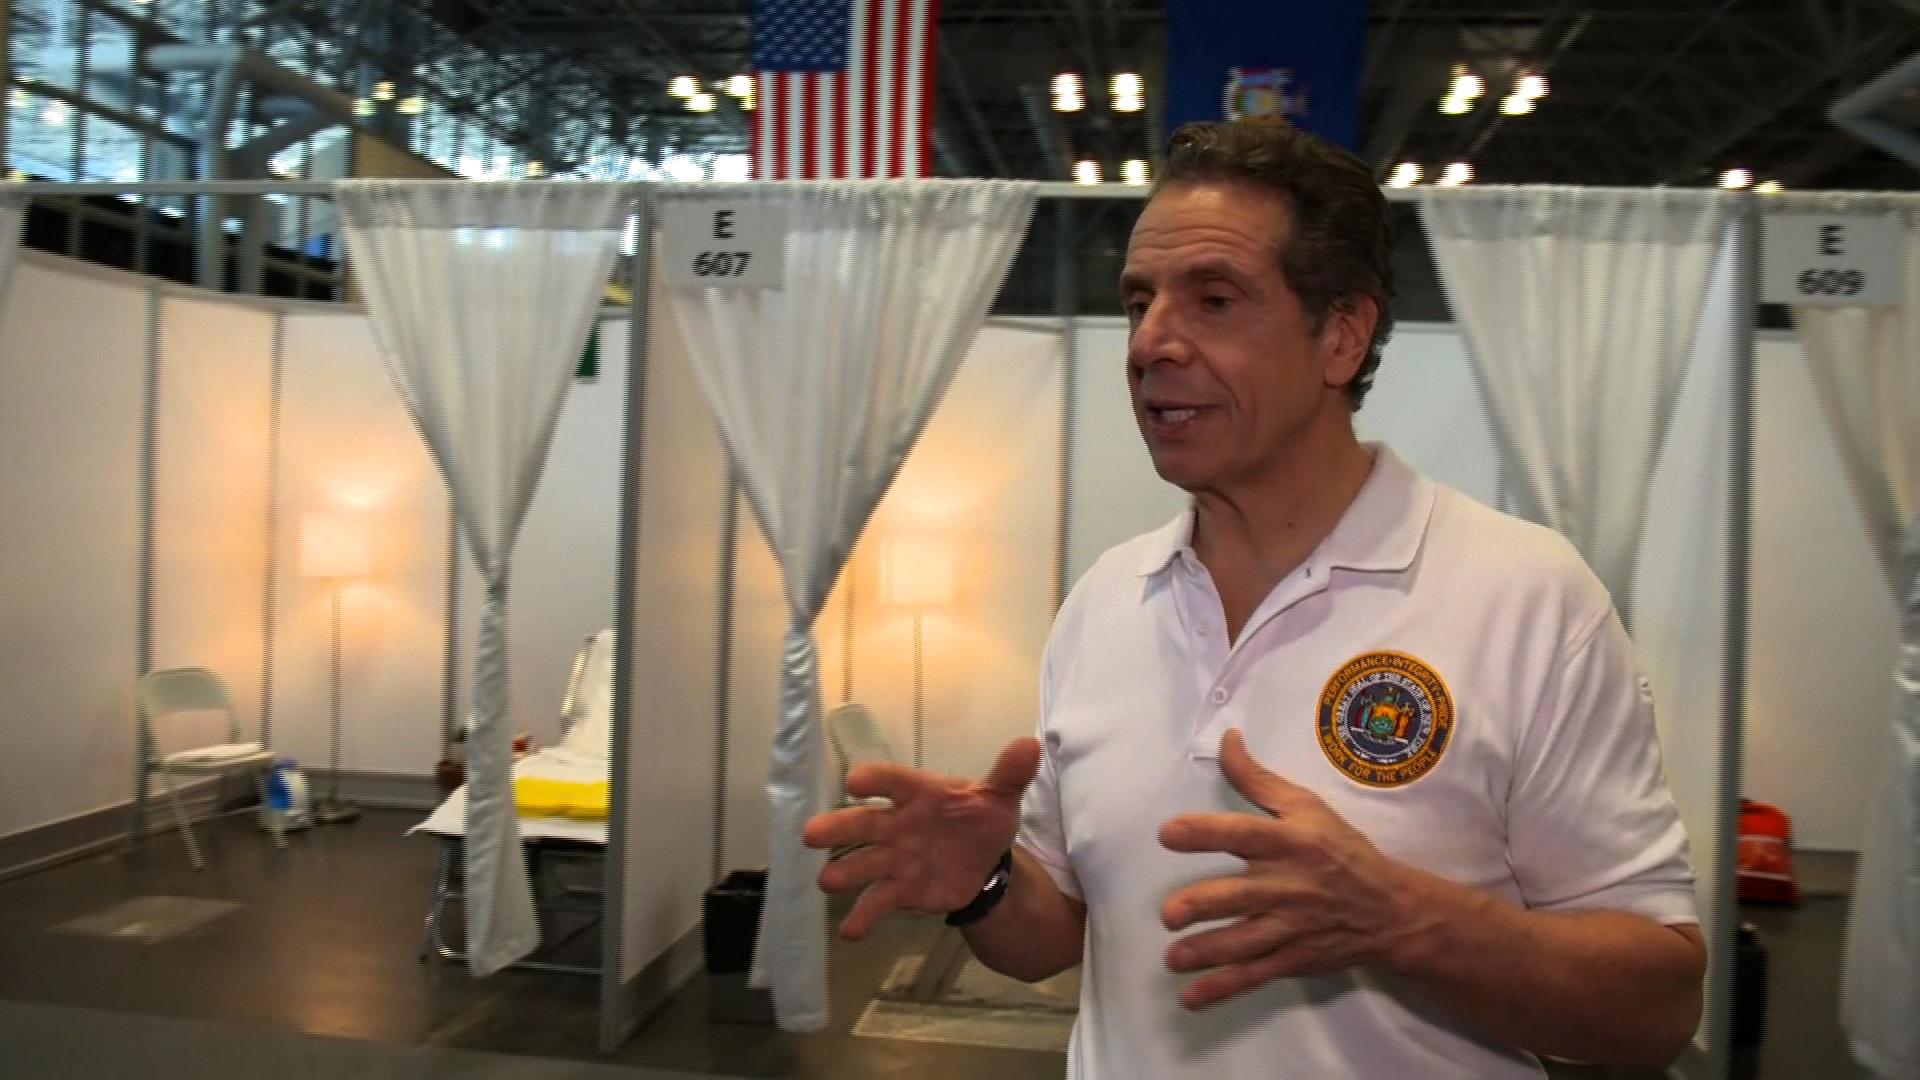 Cuomo: No one is going to treat New York 'unfairly' over coronavirus